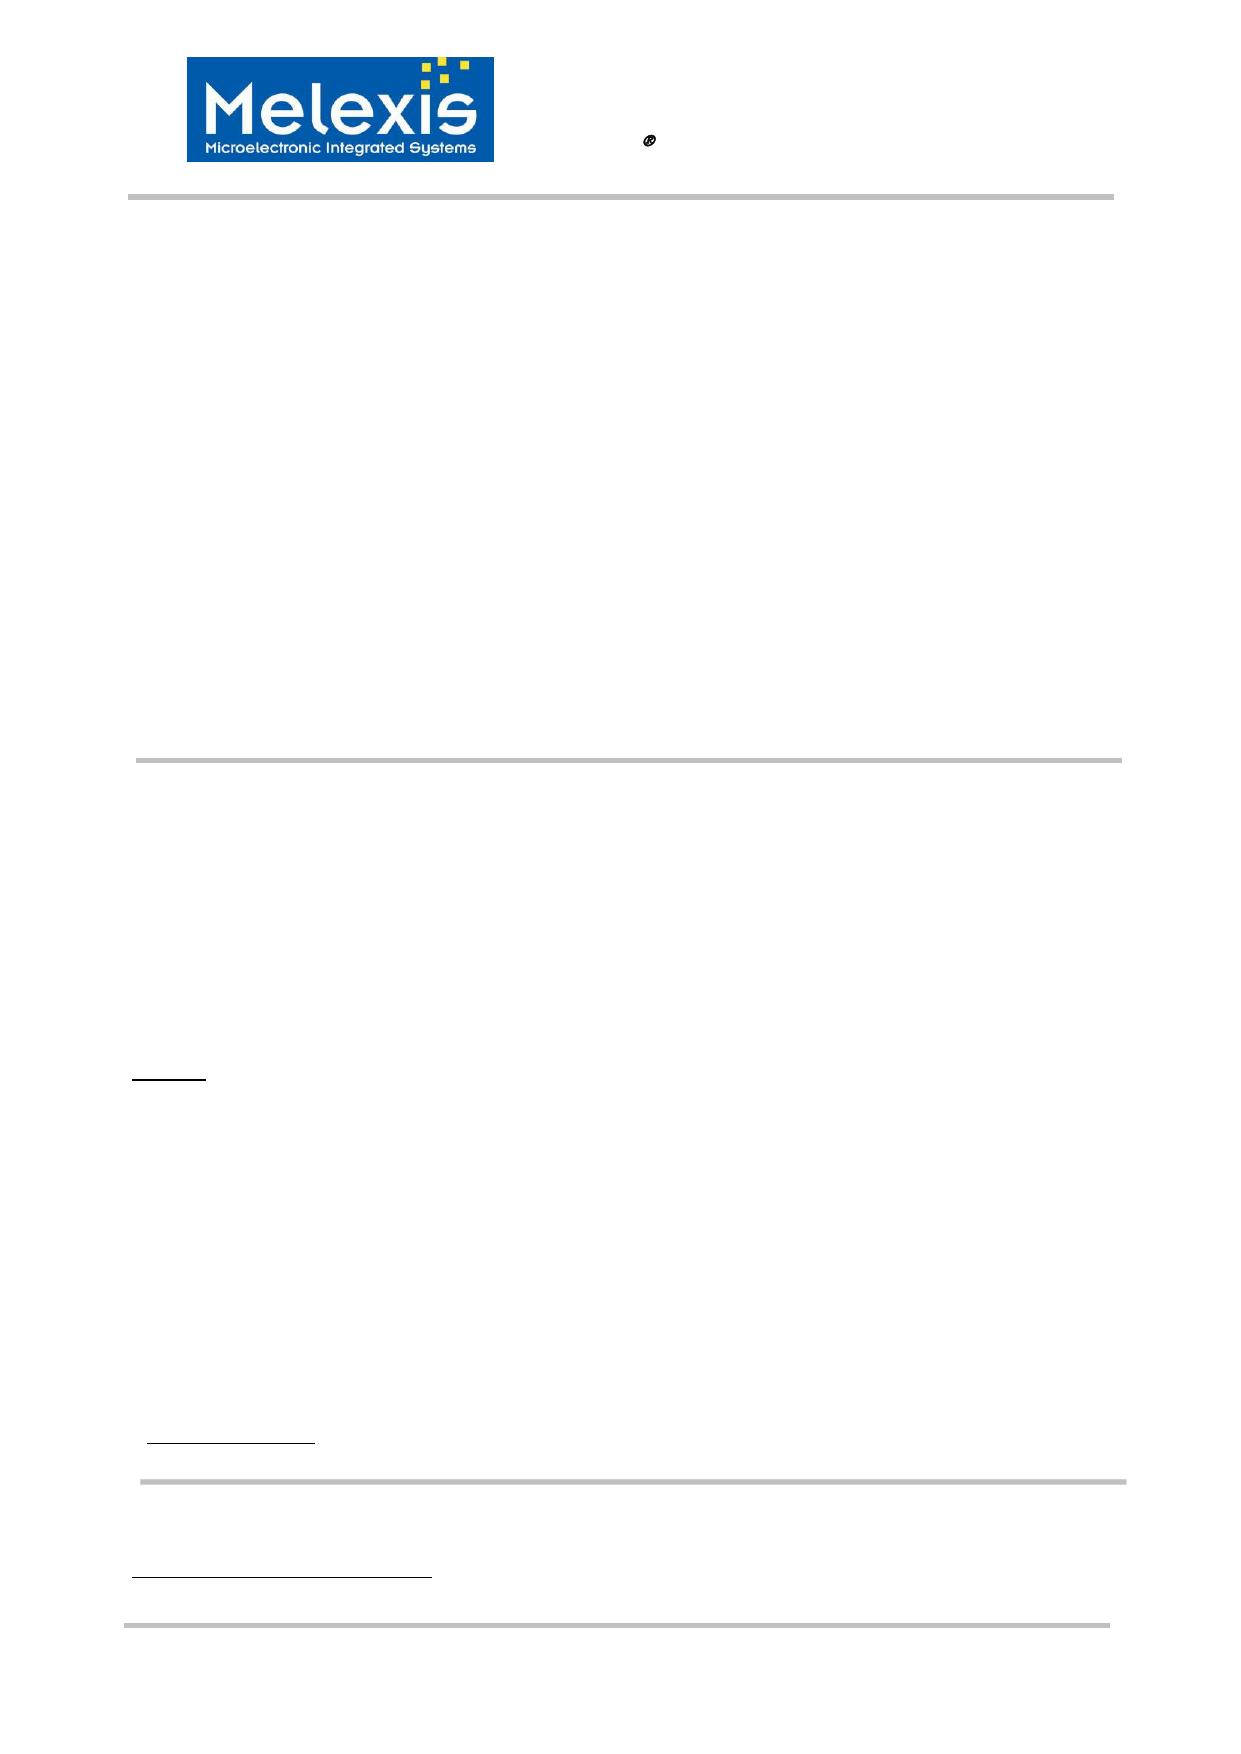 MLX90366 데이터시트 및 MLX90366 PDF